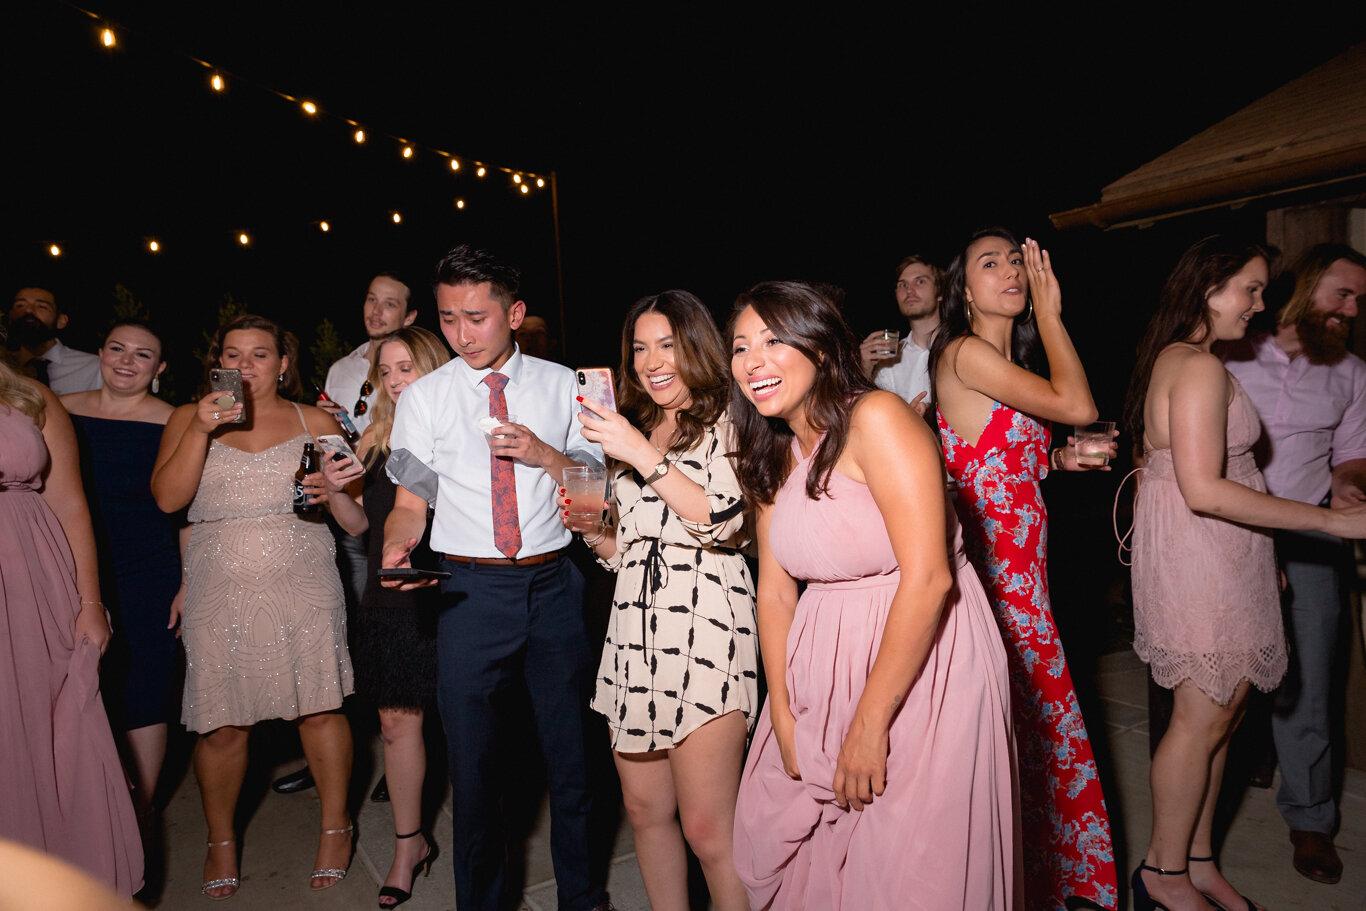 2019.08.24_Emily-Ashir-Wedding-at-the-Maples-6492.jpg